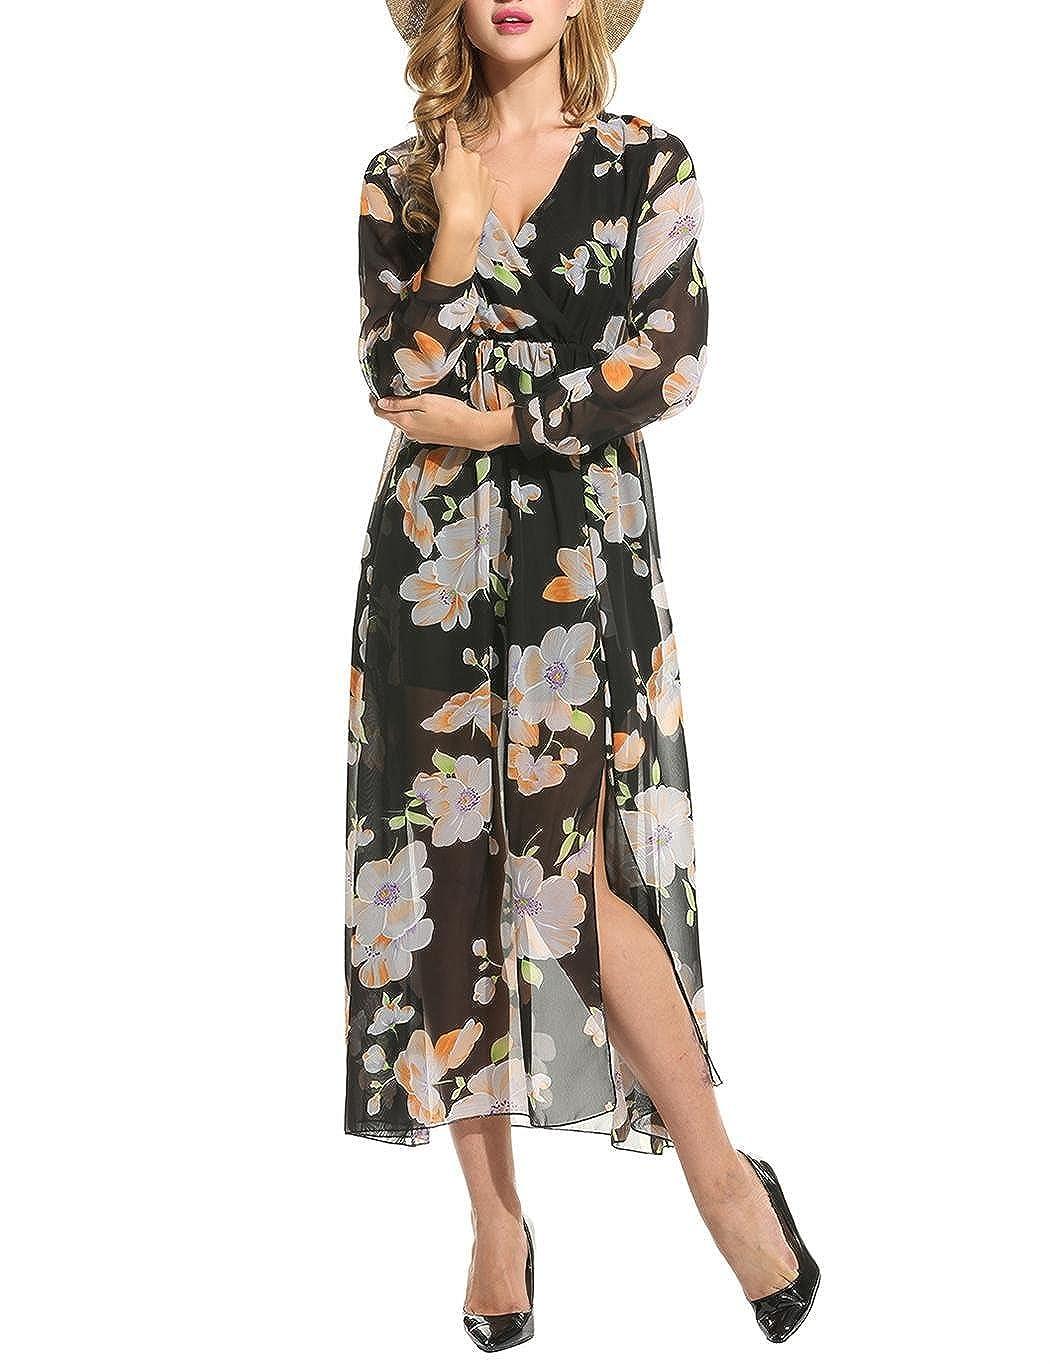 9540736a88e9 Zeagoo Women Floral Chiffon Deep V-Neck Long Sleeve Slit Wrap Long Maxi  Beach Dress A-black X-Large at Amazon Women s Clothing store